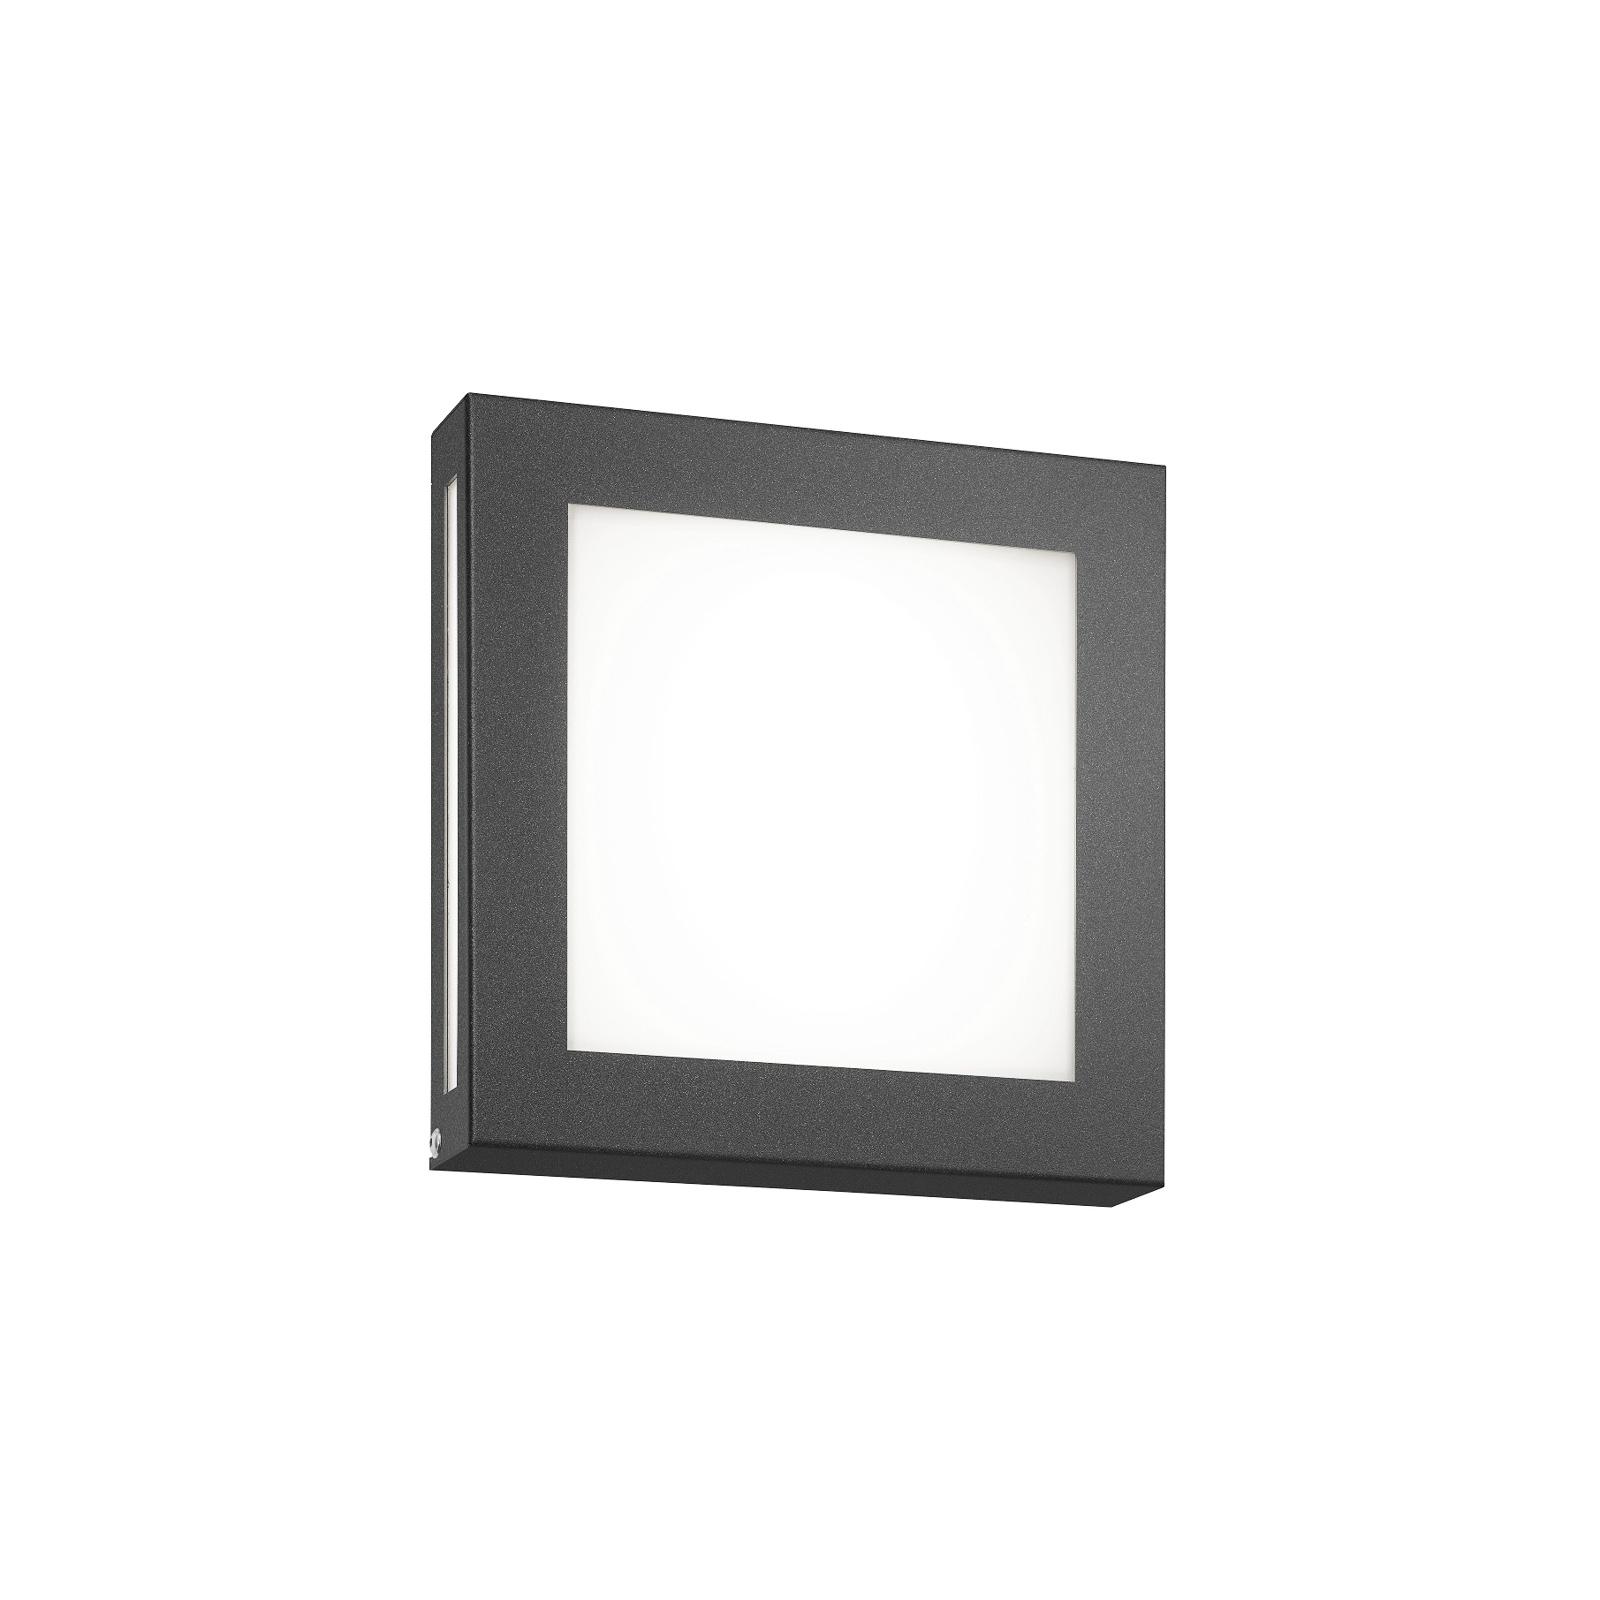 Legendo Mini LED outdoor wall light, anthracite_2011222_1